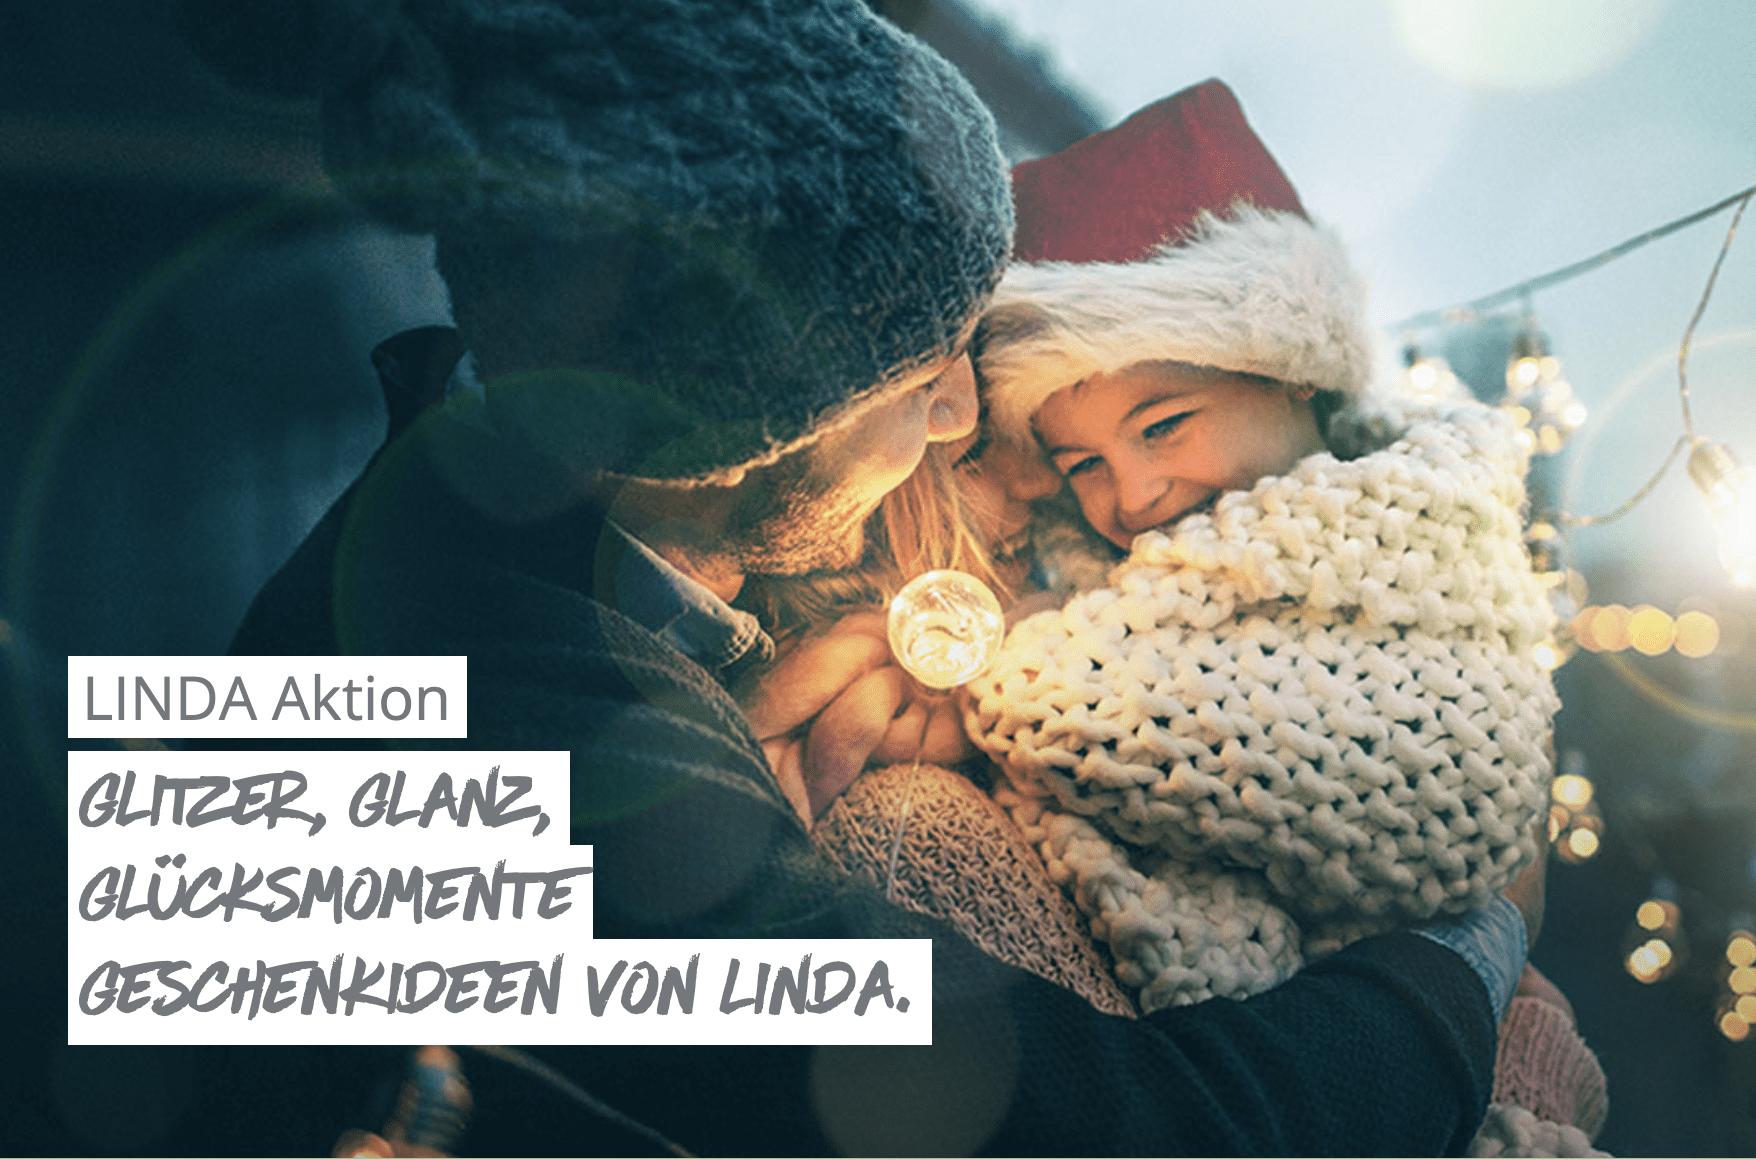 Lindani Cases Adventskalender-Gewinnspiel